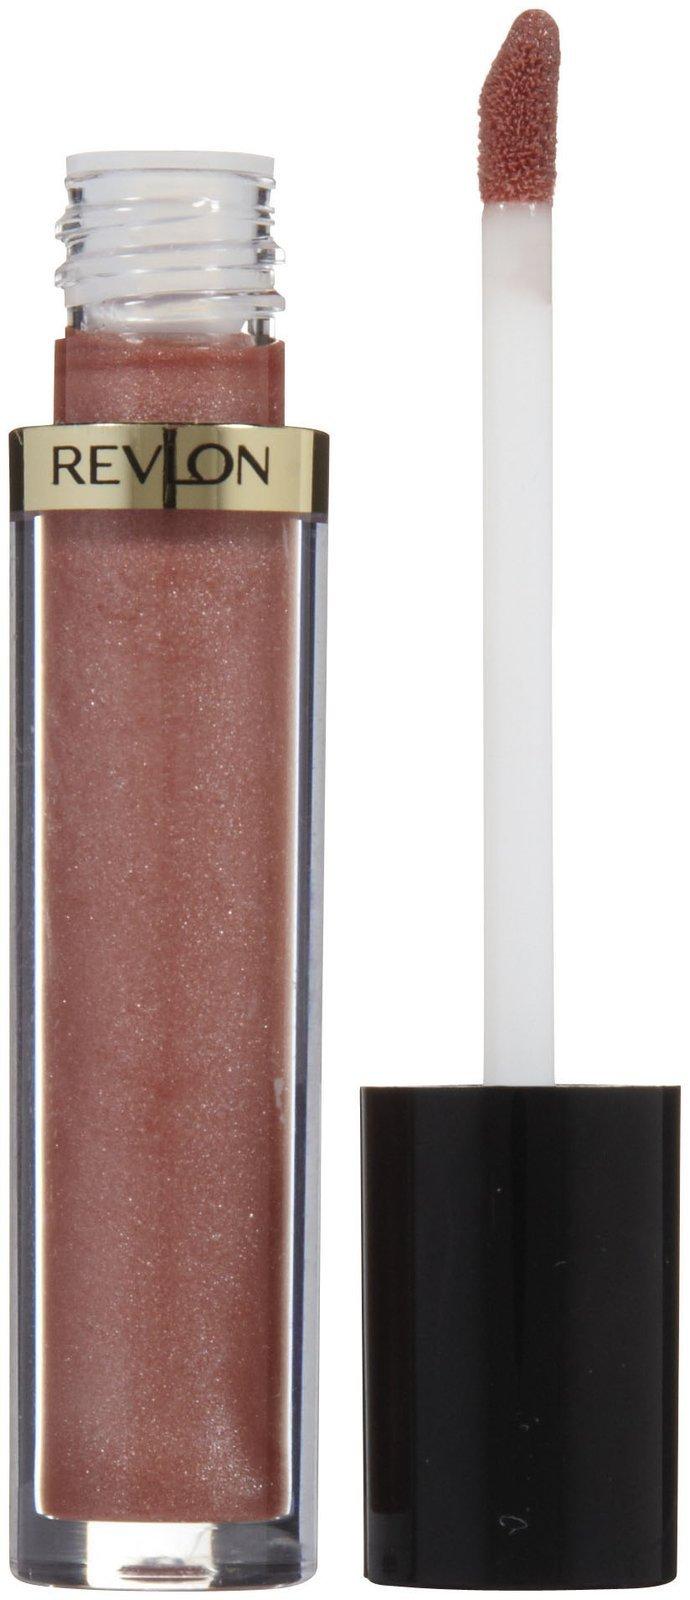 Revlon Super Lustrous Lip Gloss, Rosy Future